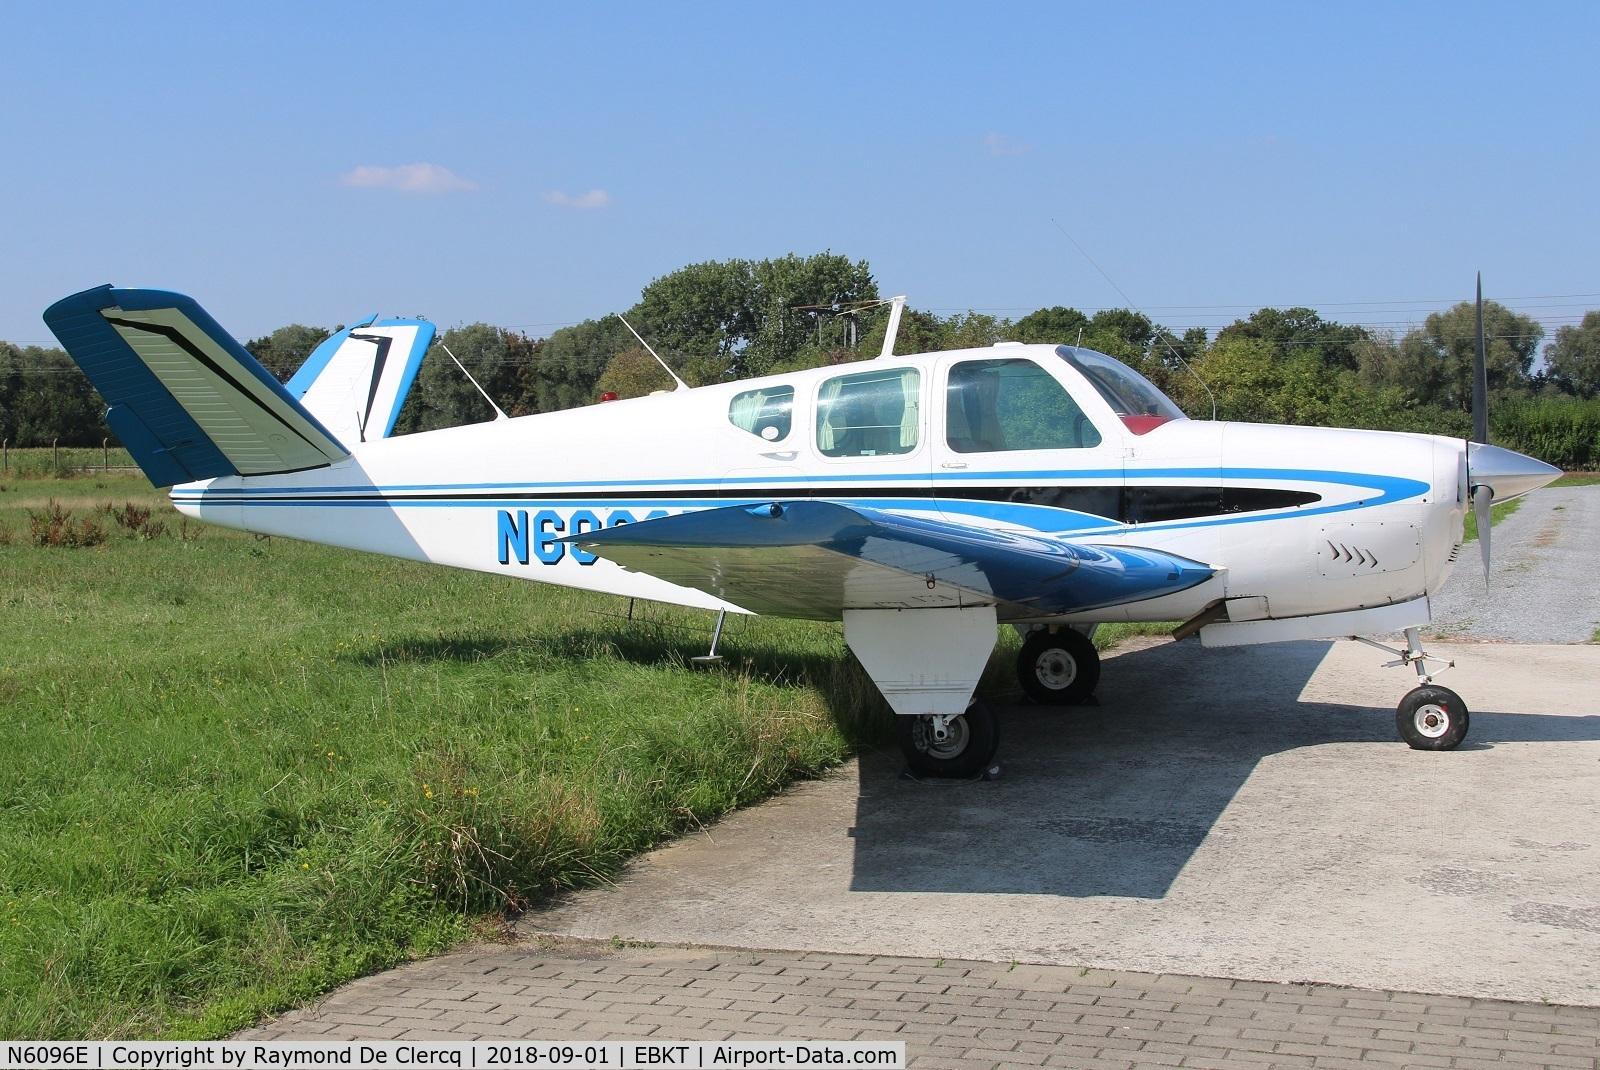 N6096E, 1959 Beech K35 Bonanza C/N D-6036, Parked at Wevelgem.